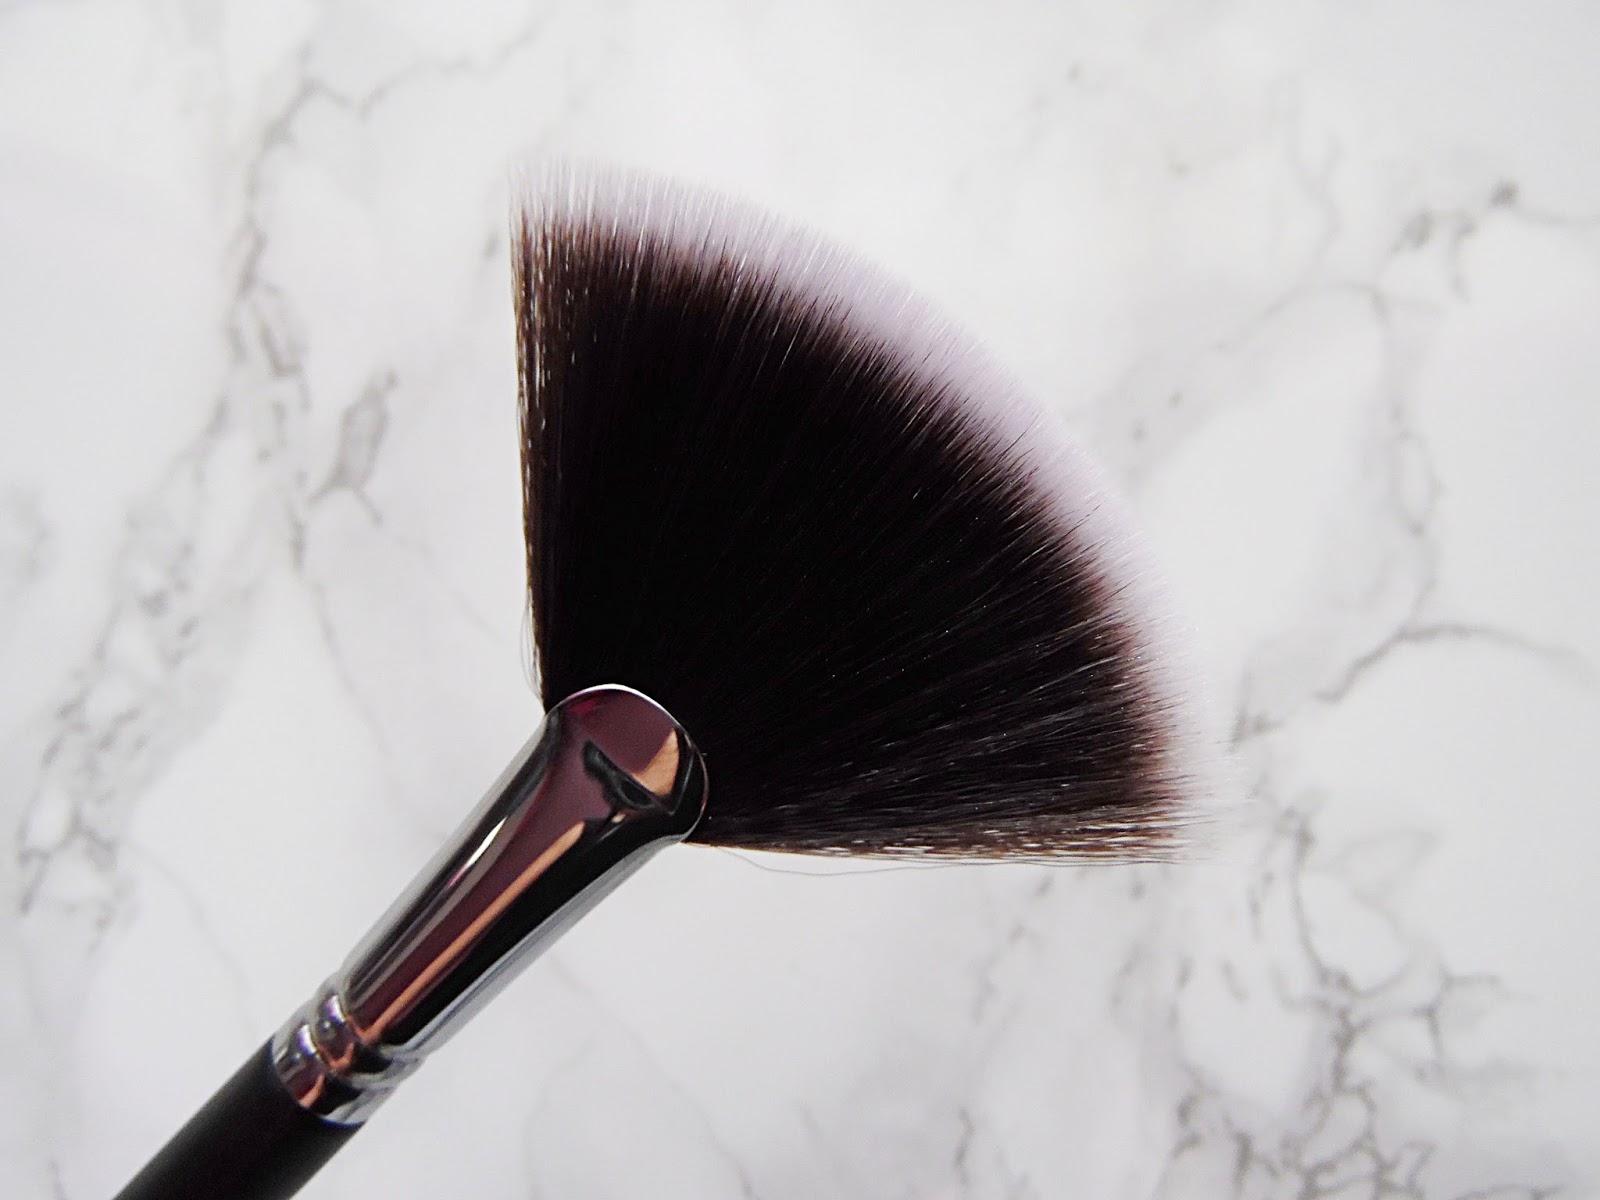 Nanshy Fan Brush Review